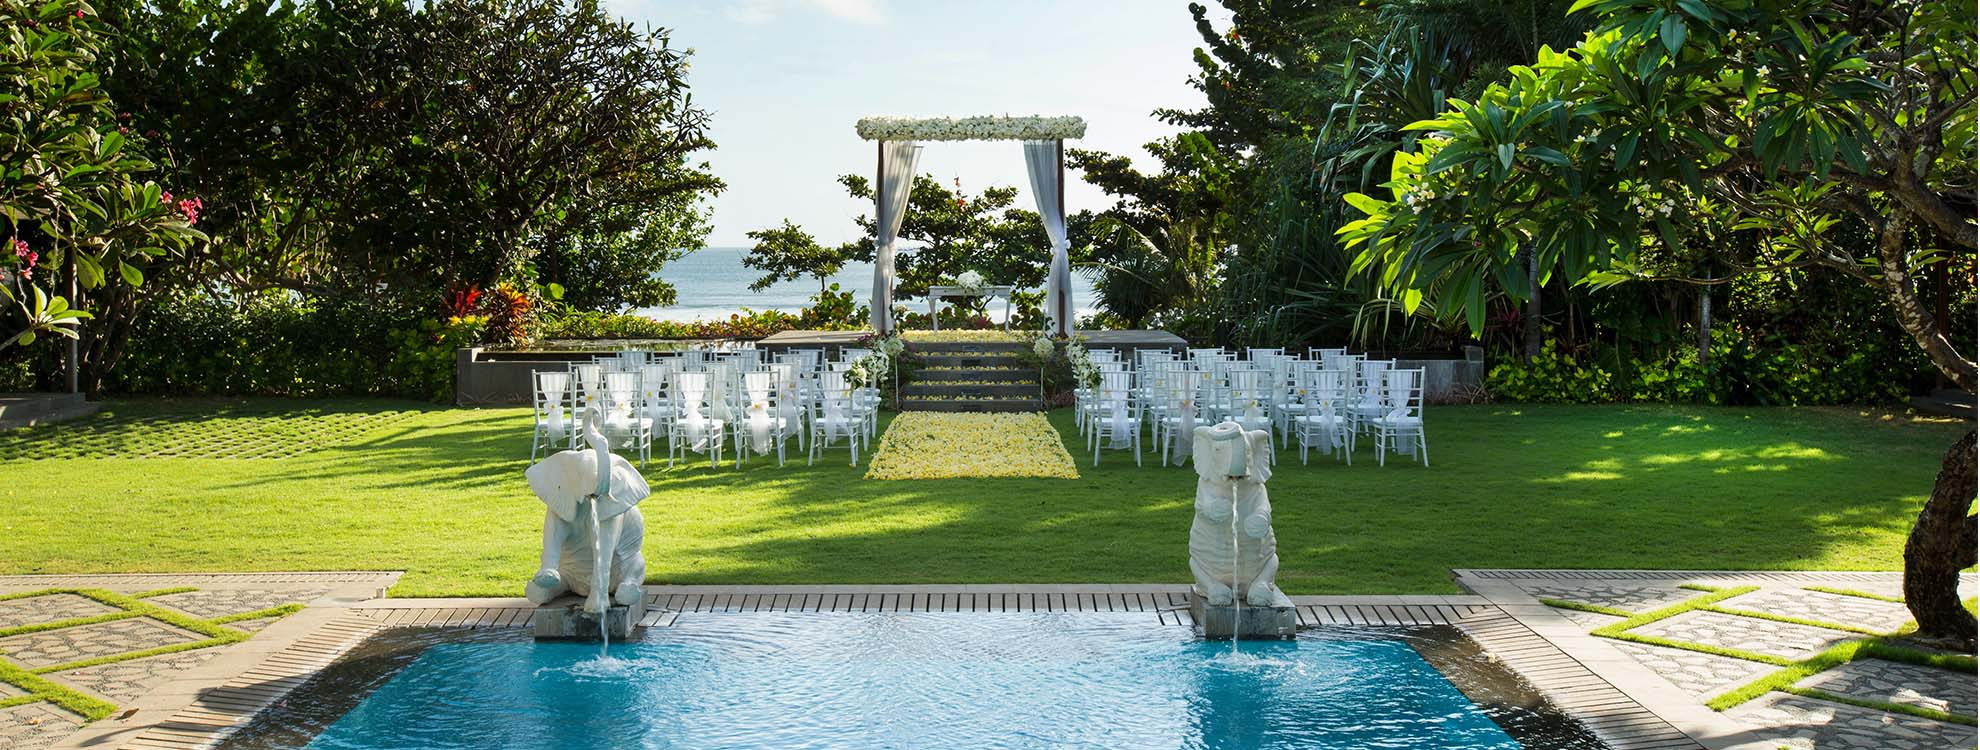 Padma Resort Bali at Legianパドマ・リゾート・バリ・アット・レギャン